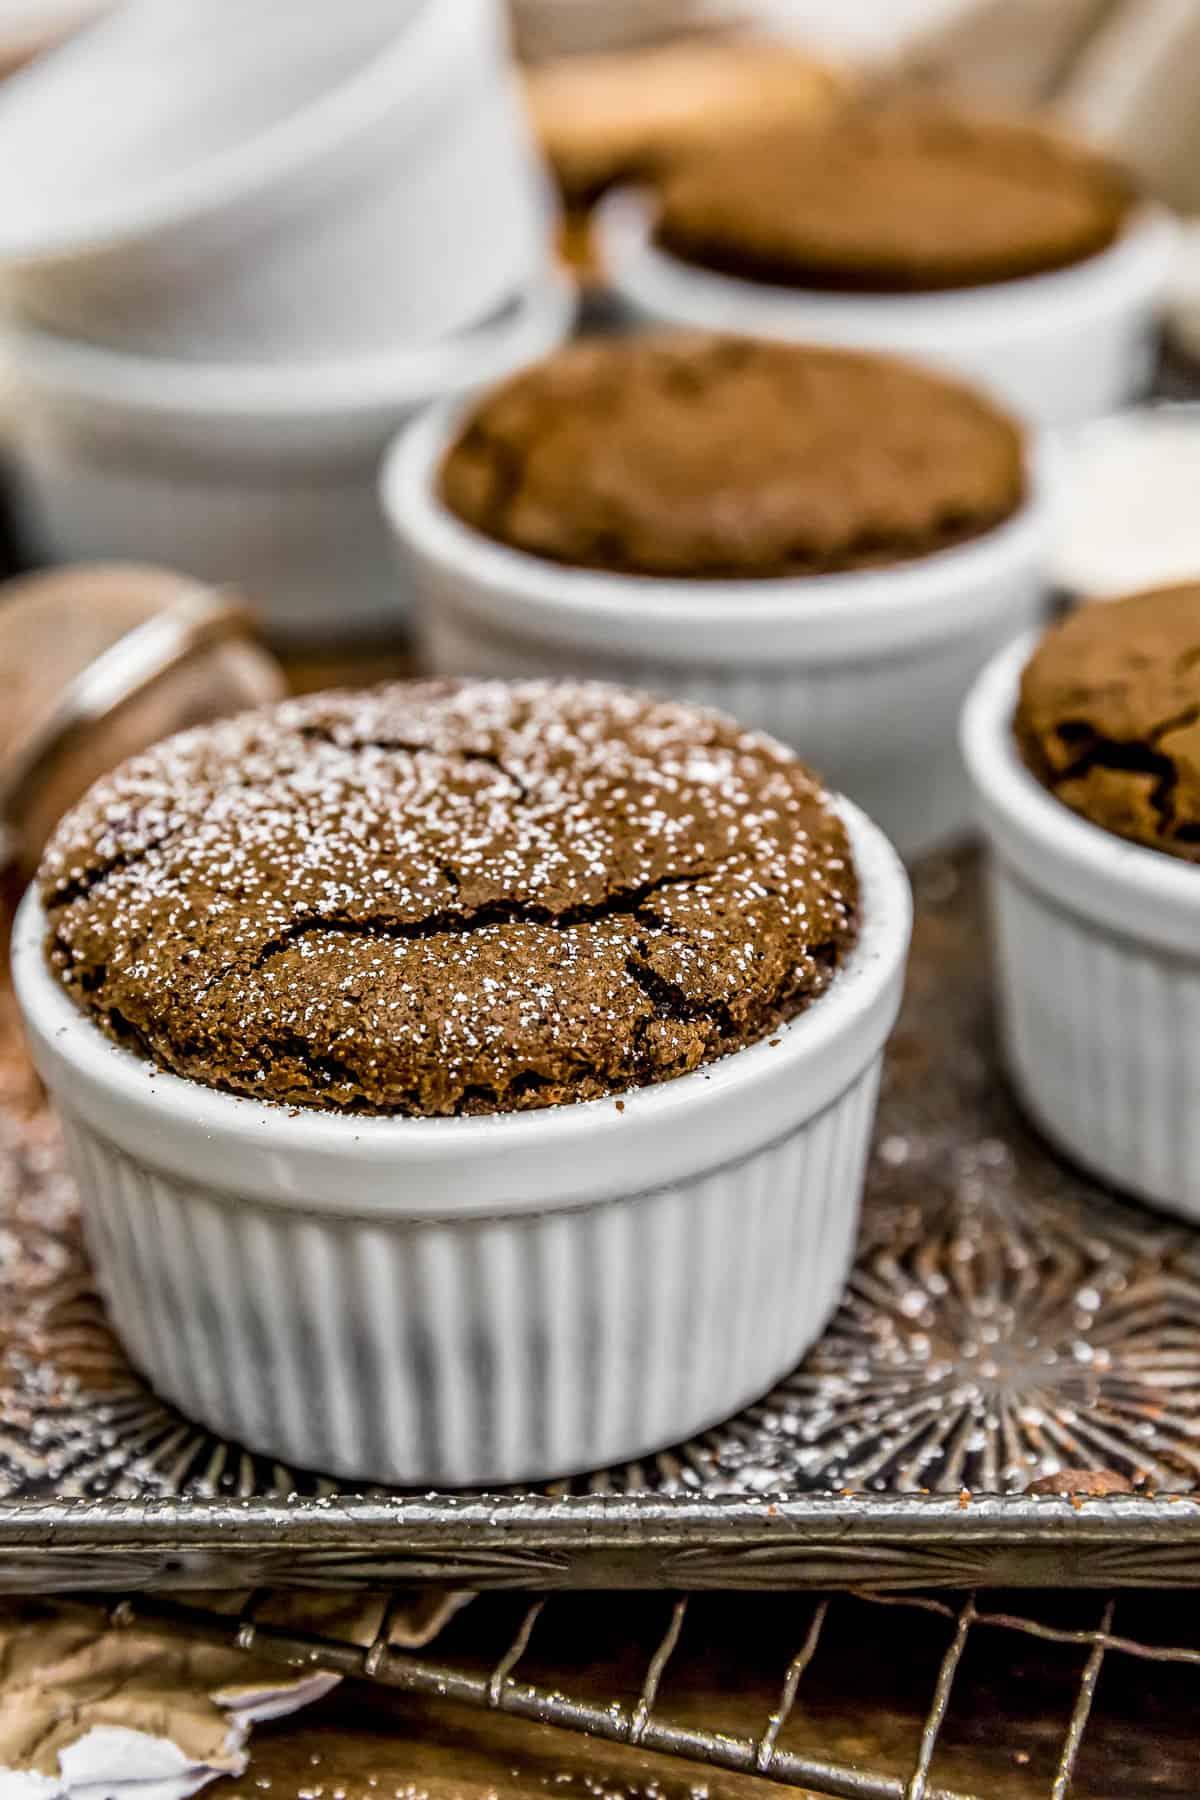 Vegan Chocolate Molten Lava Soufflé